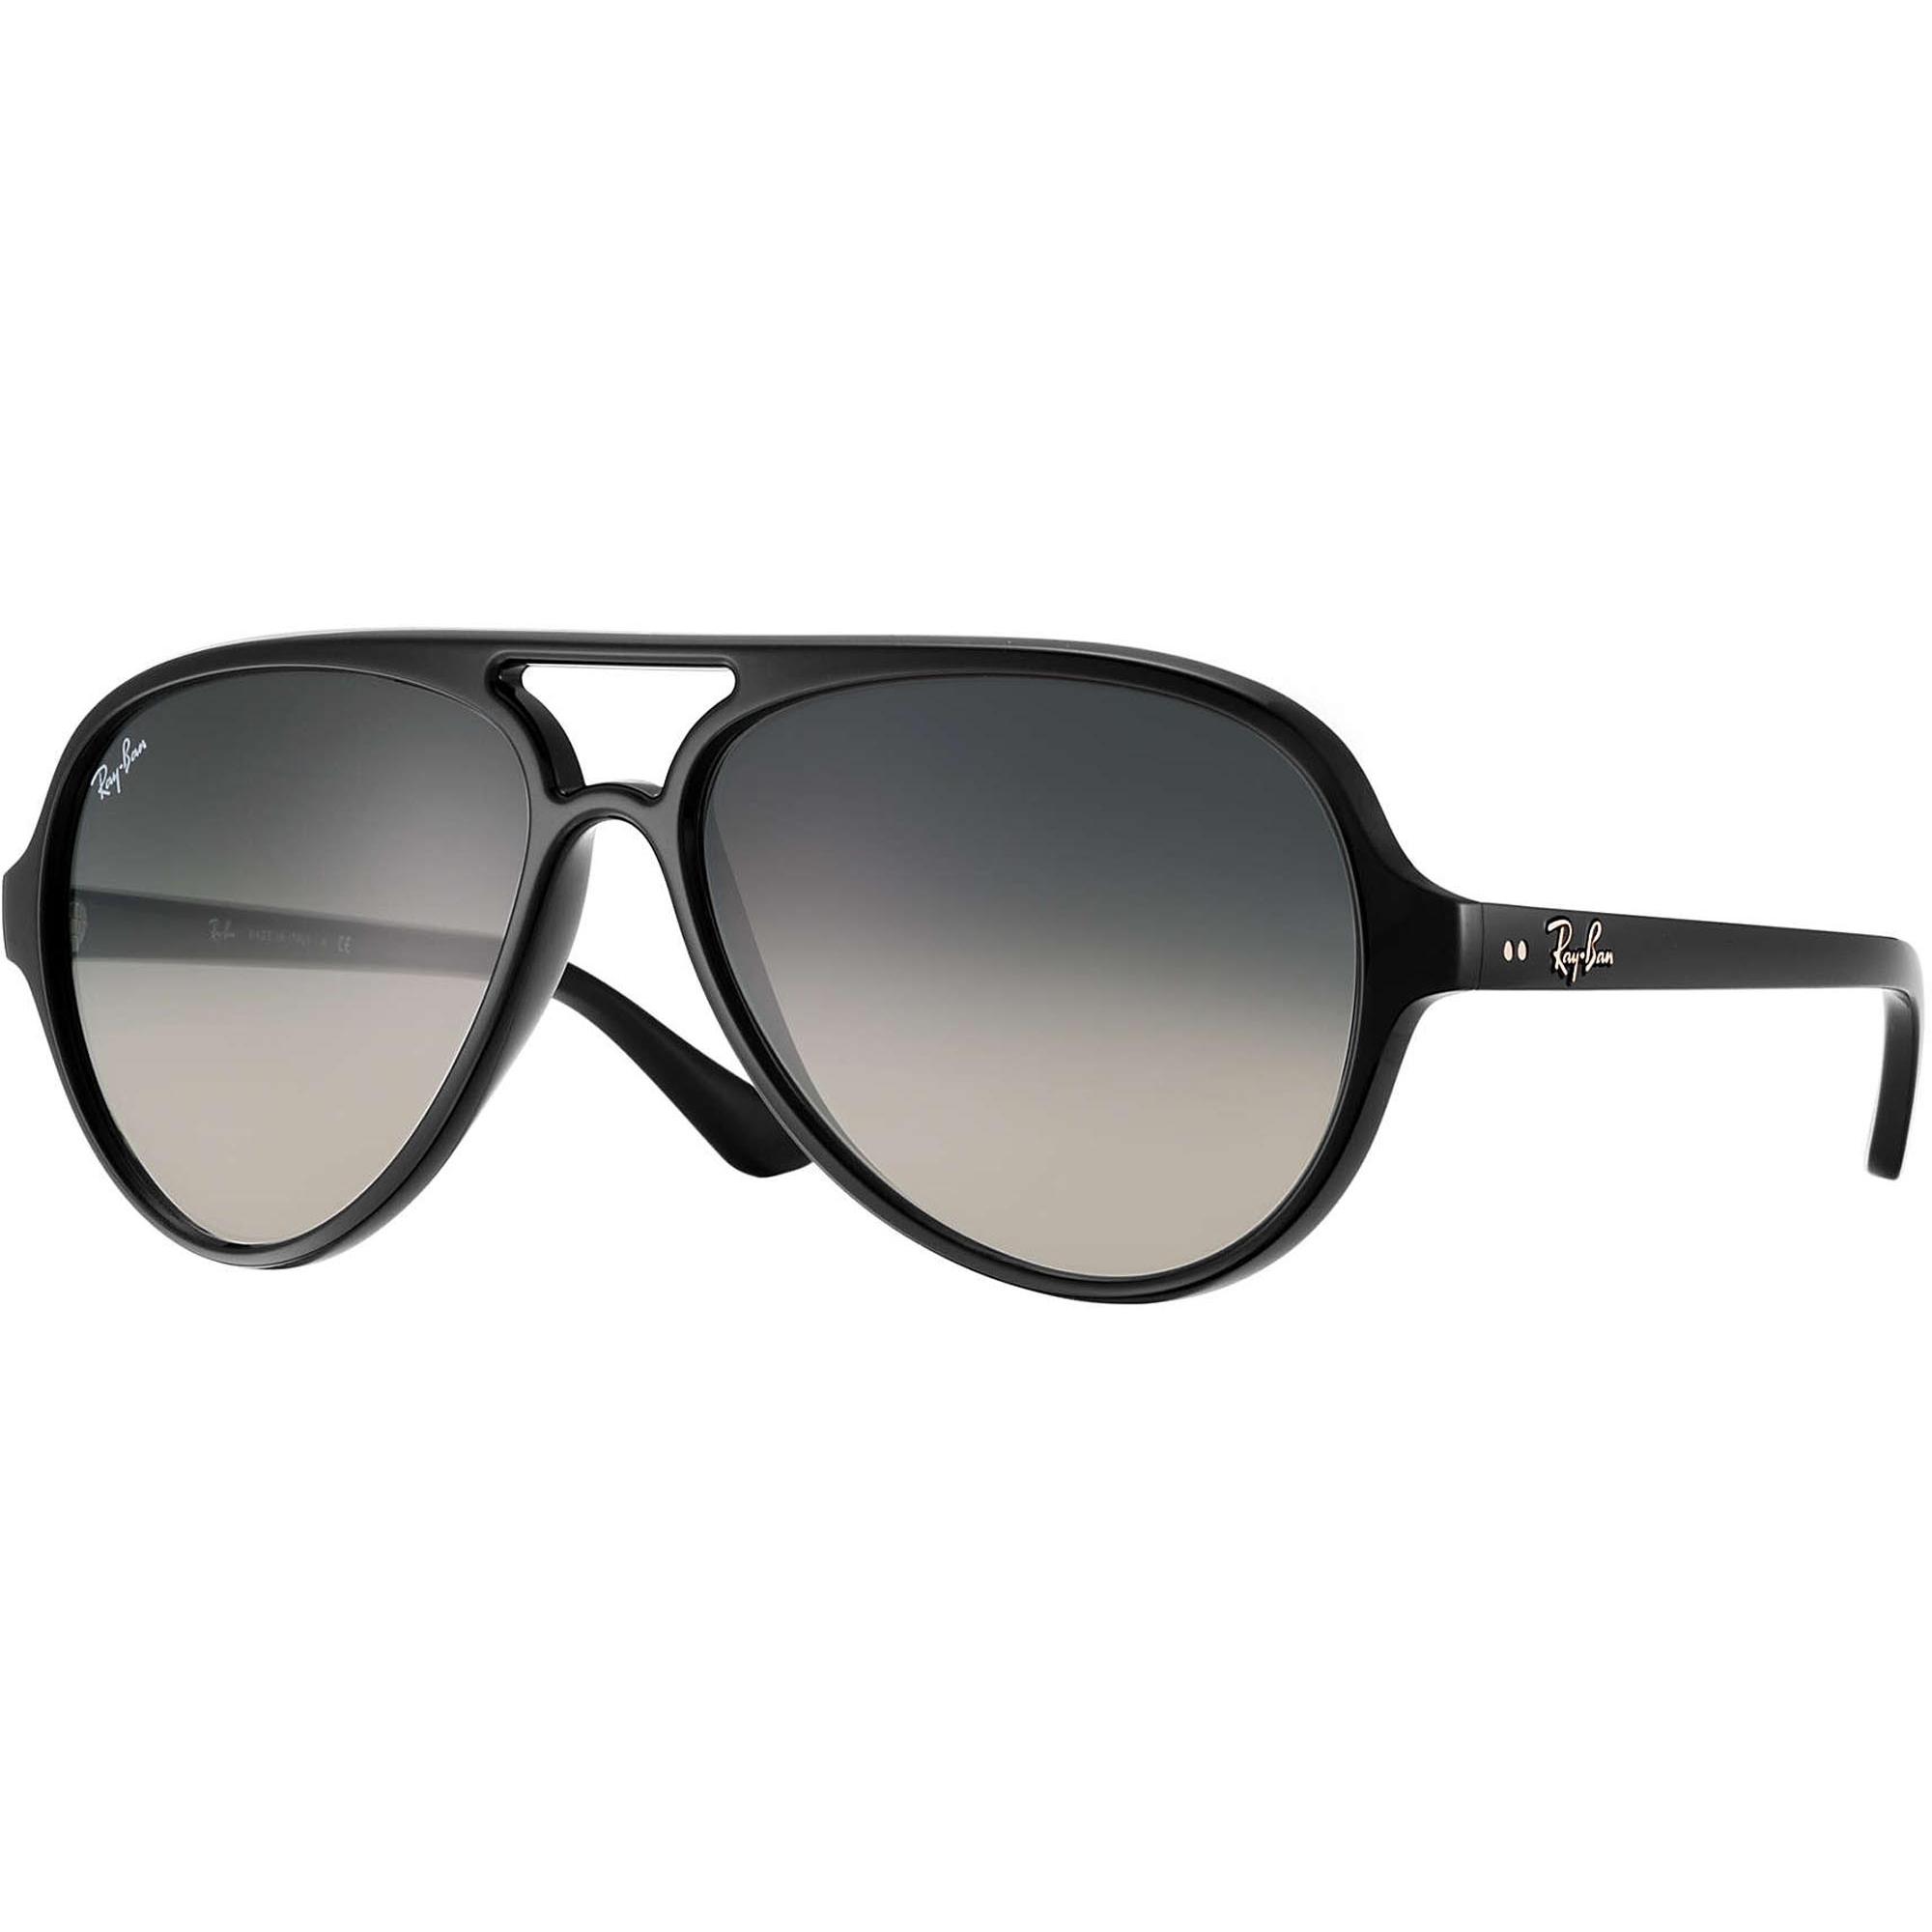 7454e4168b9 Ray Ban Sunglasses Cats 5000 Black Crystal Sunglasses RB4125 601 32